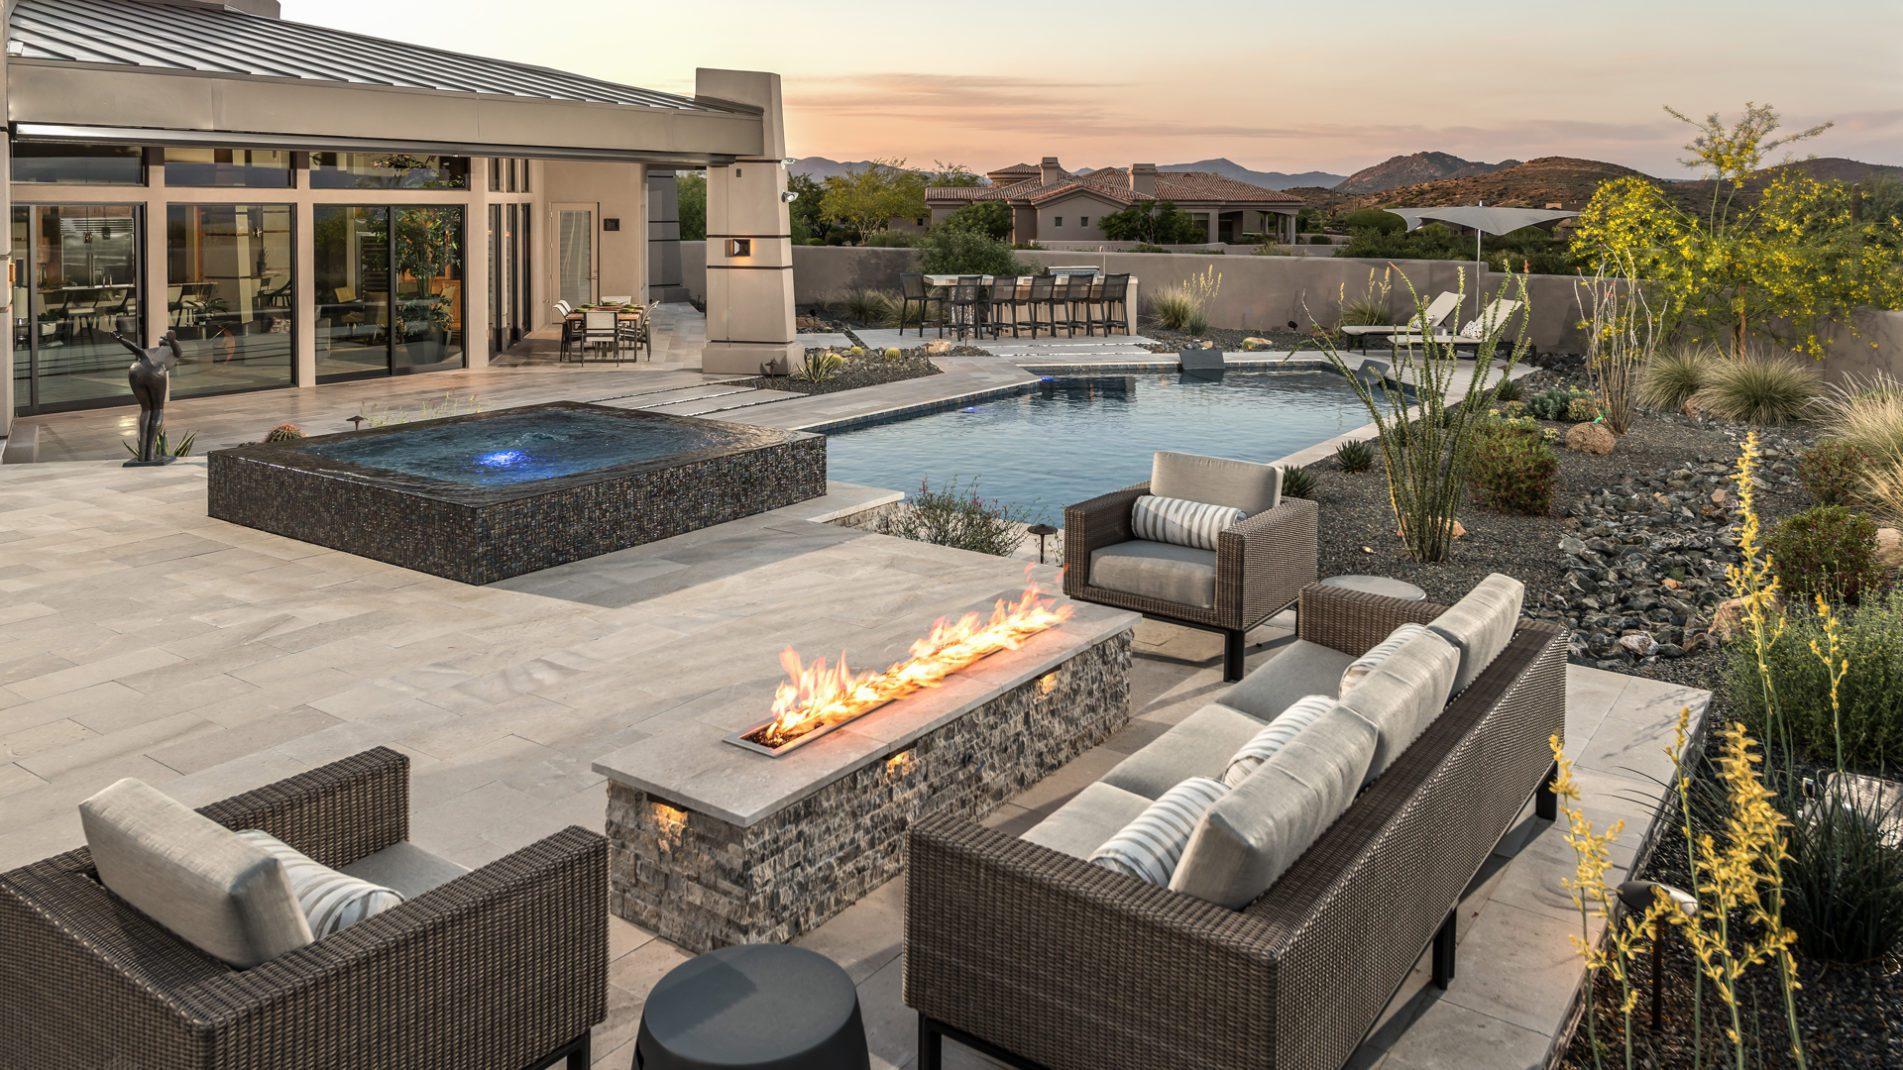 High End Ultimate Backyard and Swimming Pool